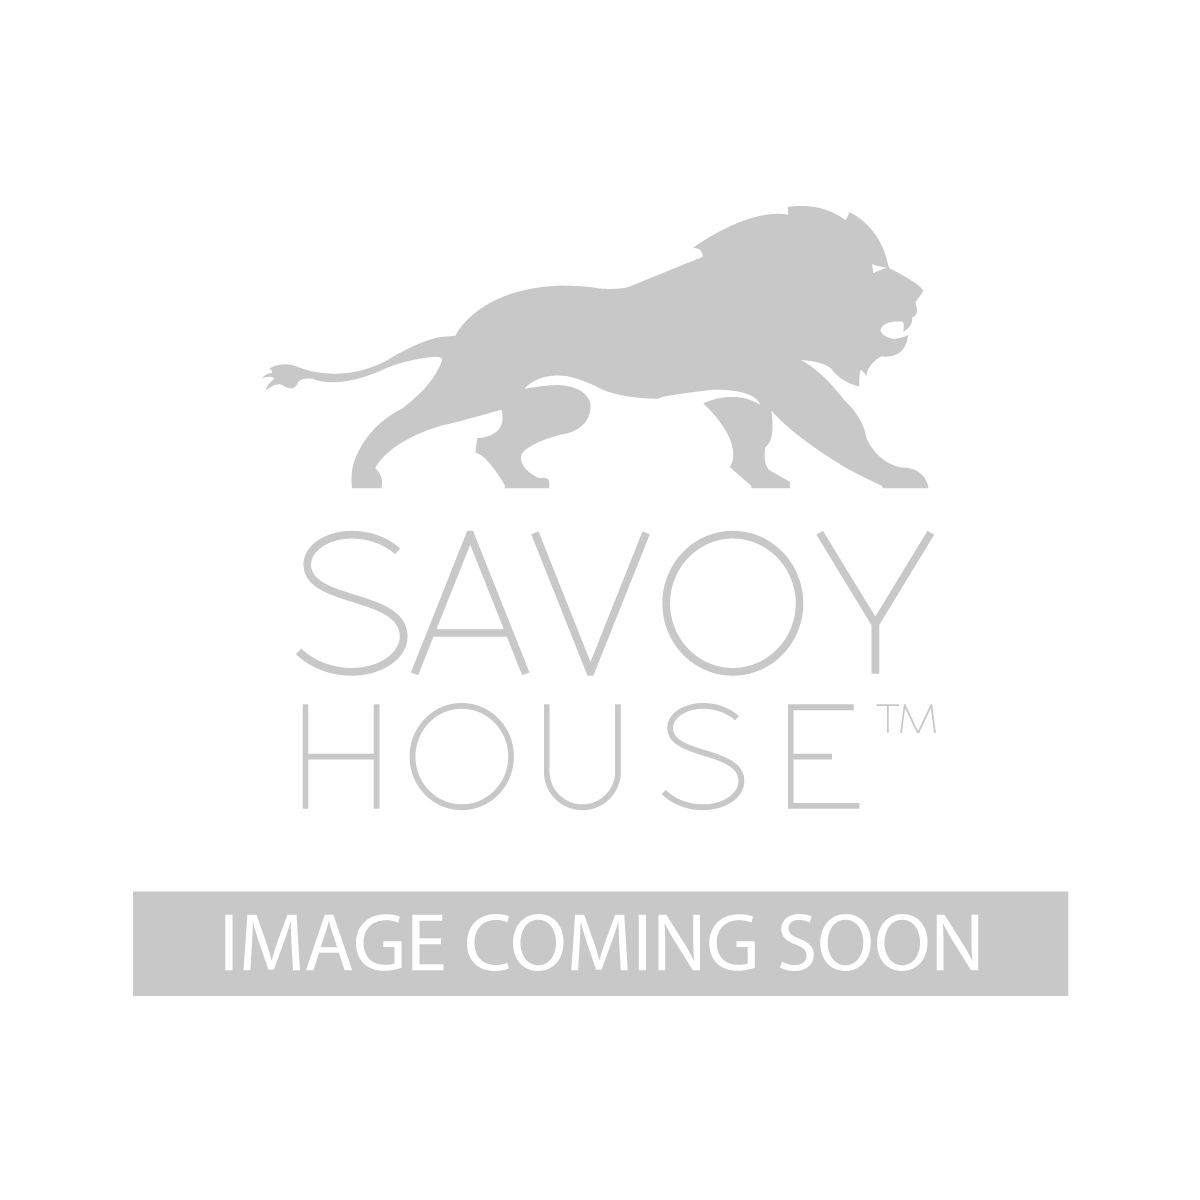 8 430 4 128 chelsey 4 light bath bar by savoy house nora 4 light bath bar aloadofball Images